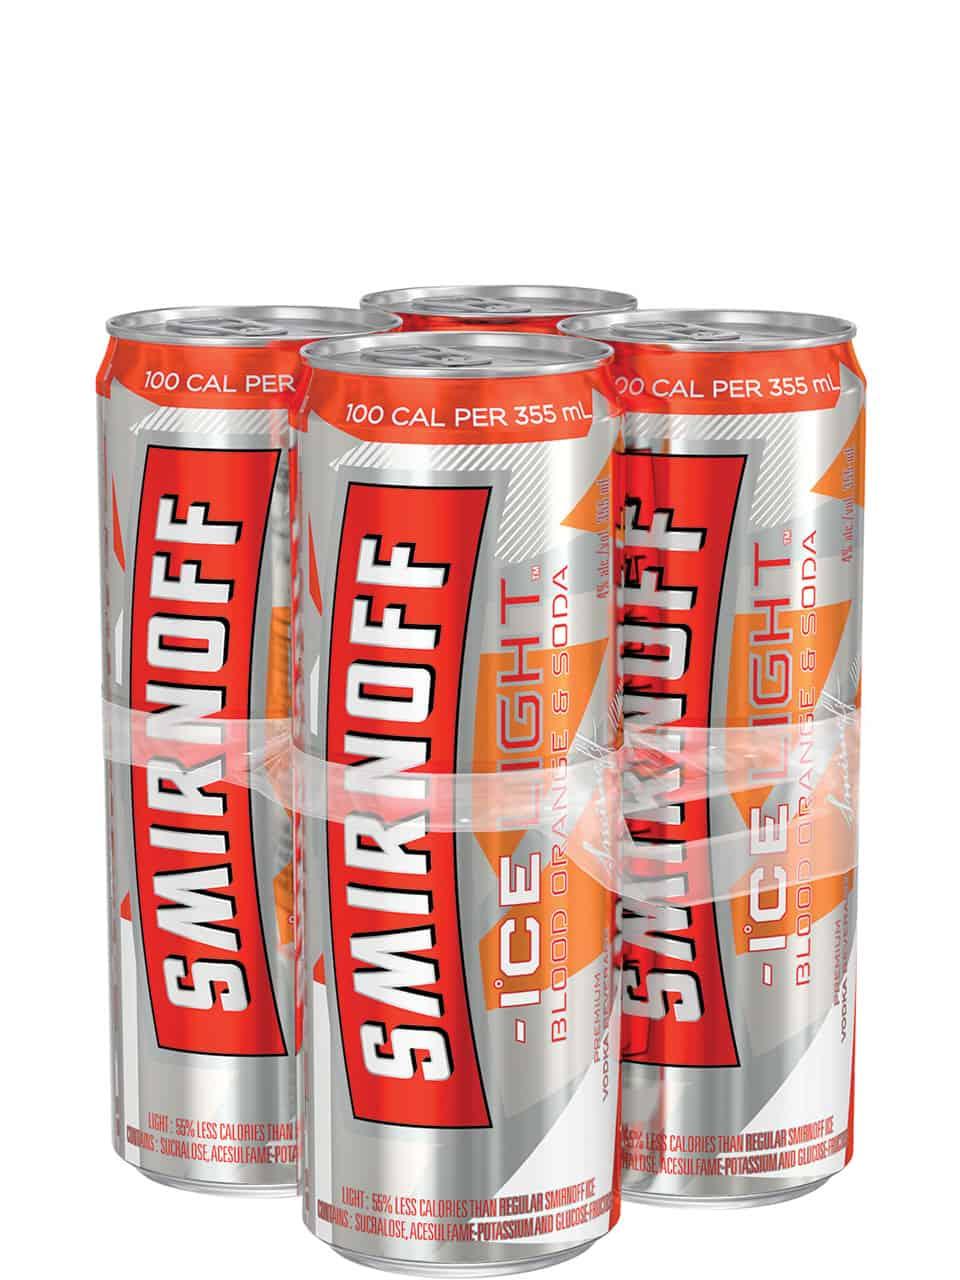 Smirnoff Ice Light Blood Orange & Soda 4 Pack Cans